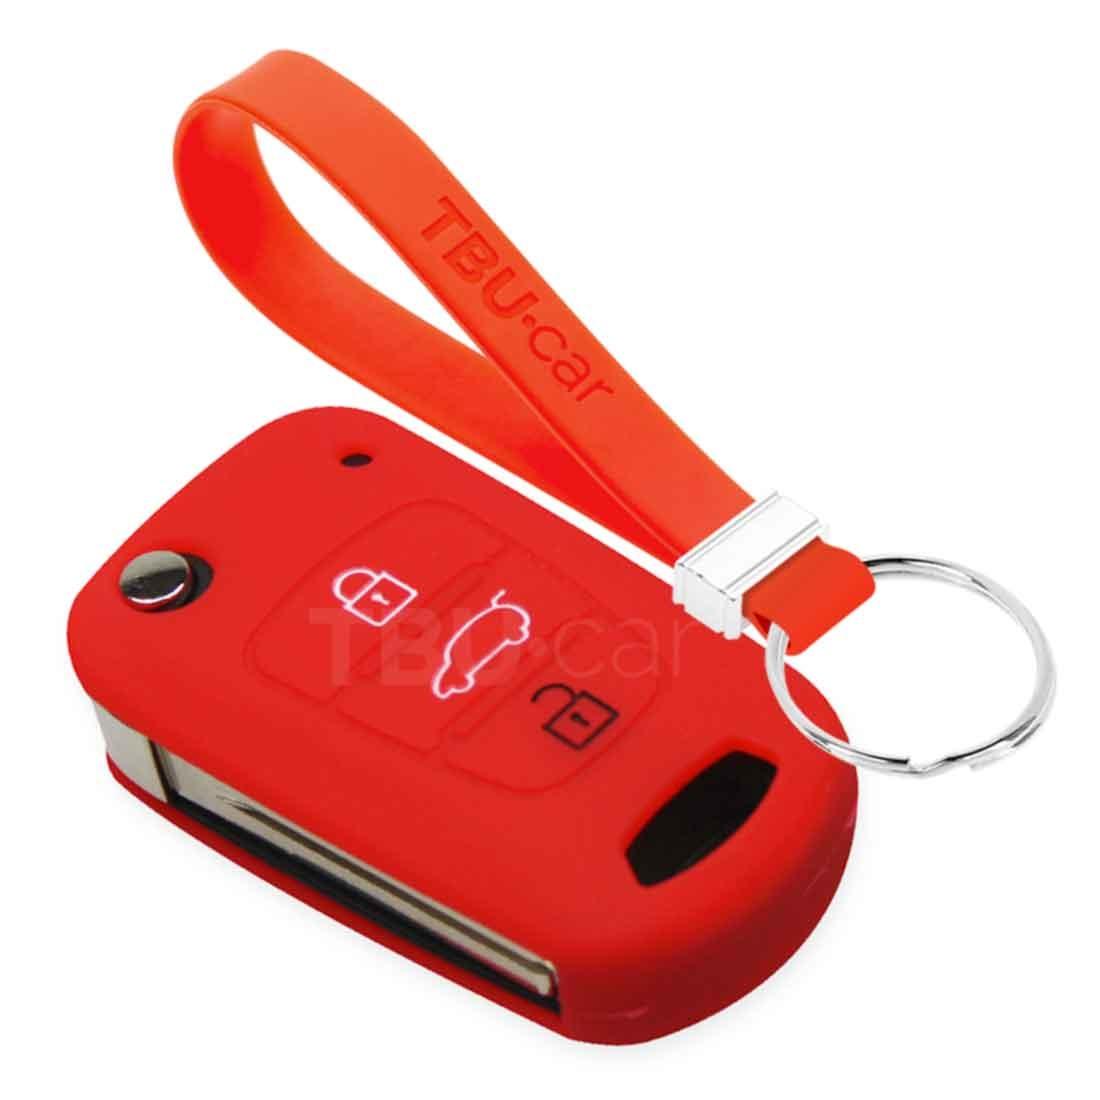 TBU car TBU car Sleutel cover compatibel met Kia - Silicone sleutelhoesje - beschermhoesje autosleutel - Rood